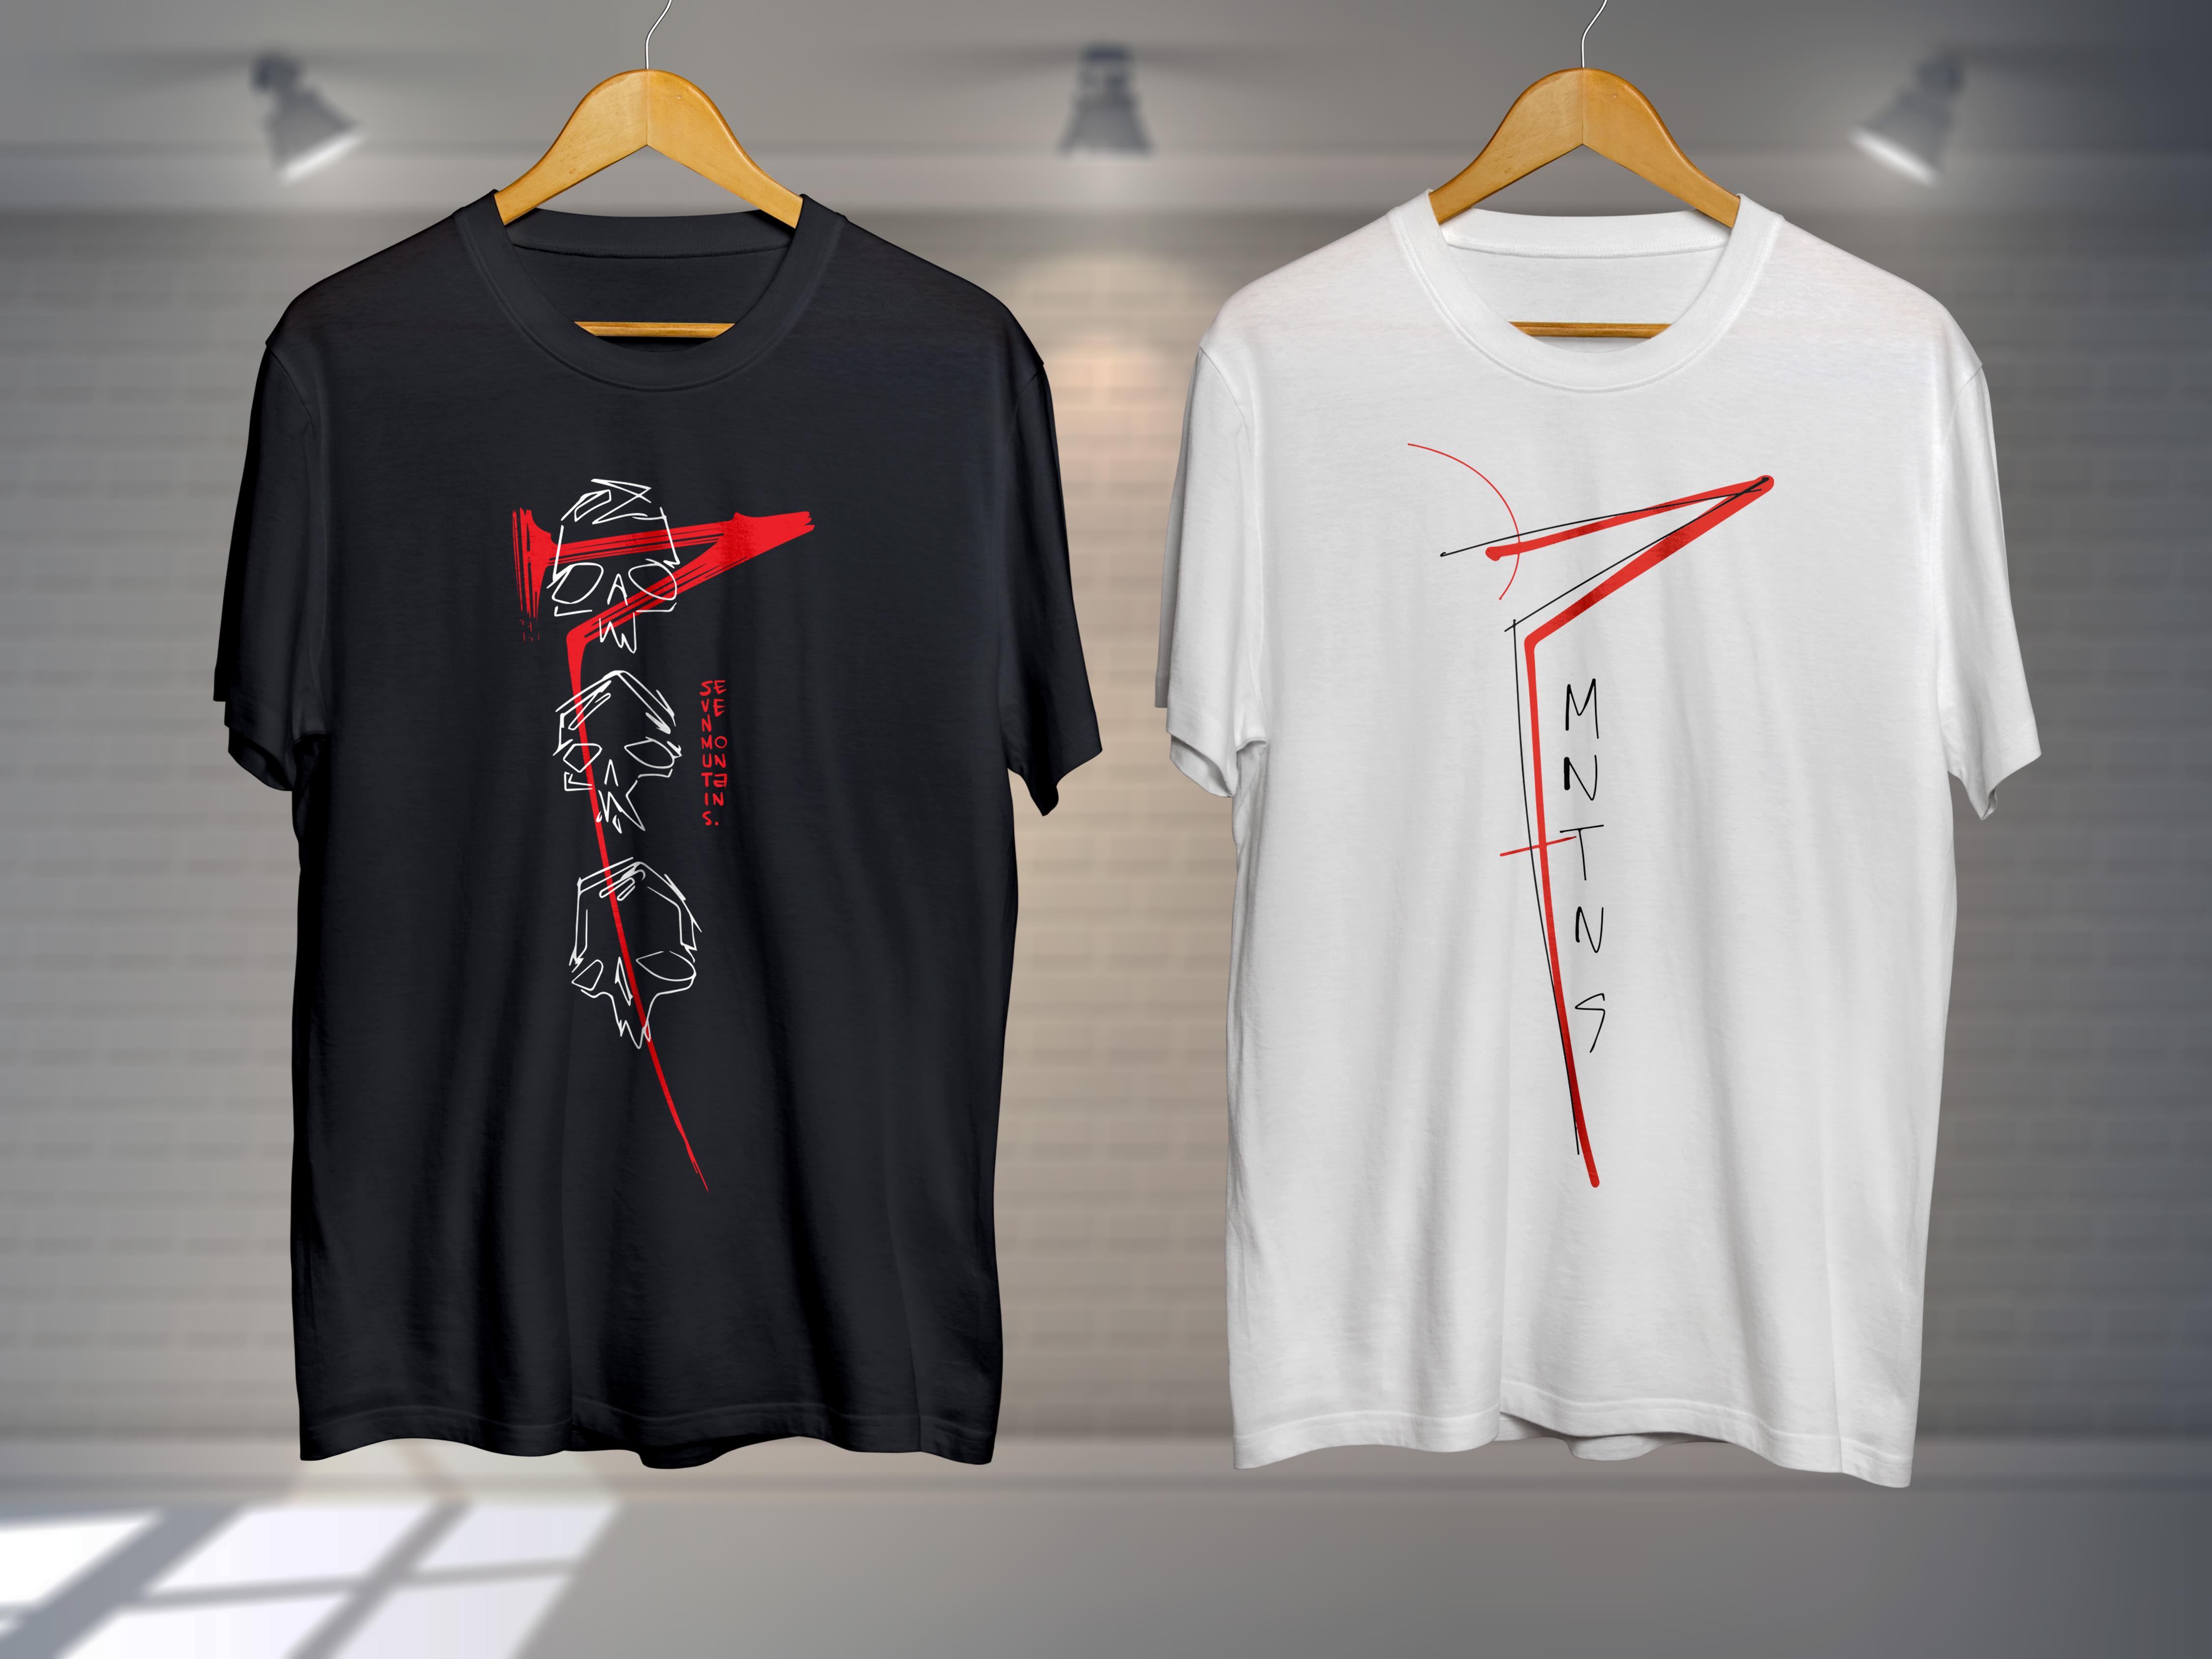 Design Custom Artworks For Streetwear Top Notch Quality By Tomastorbin